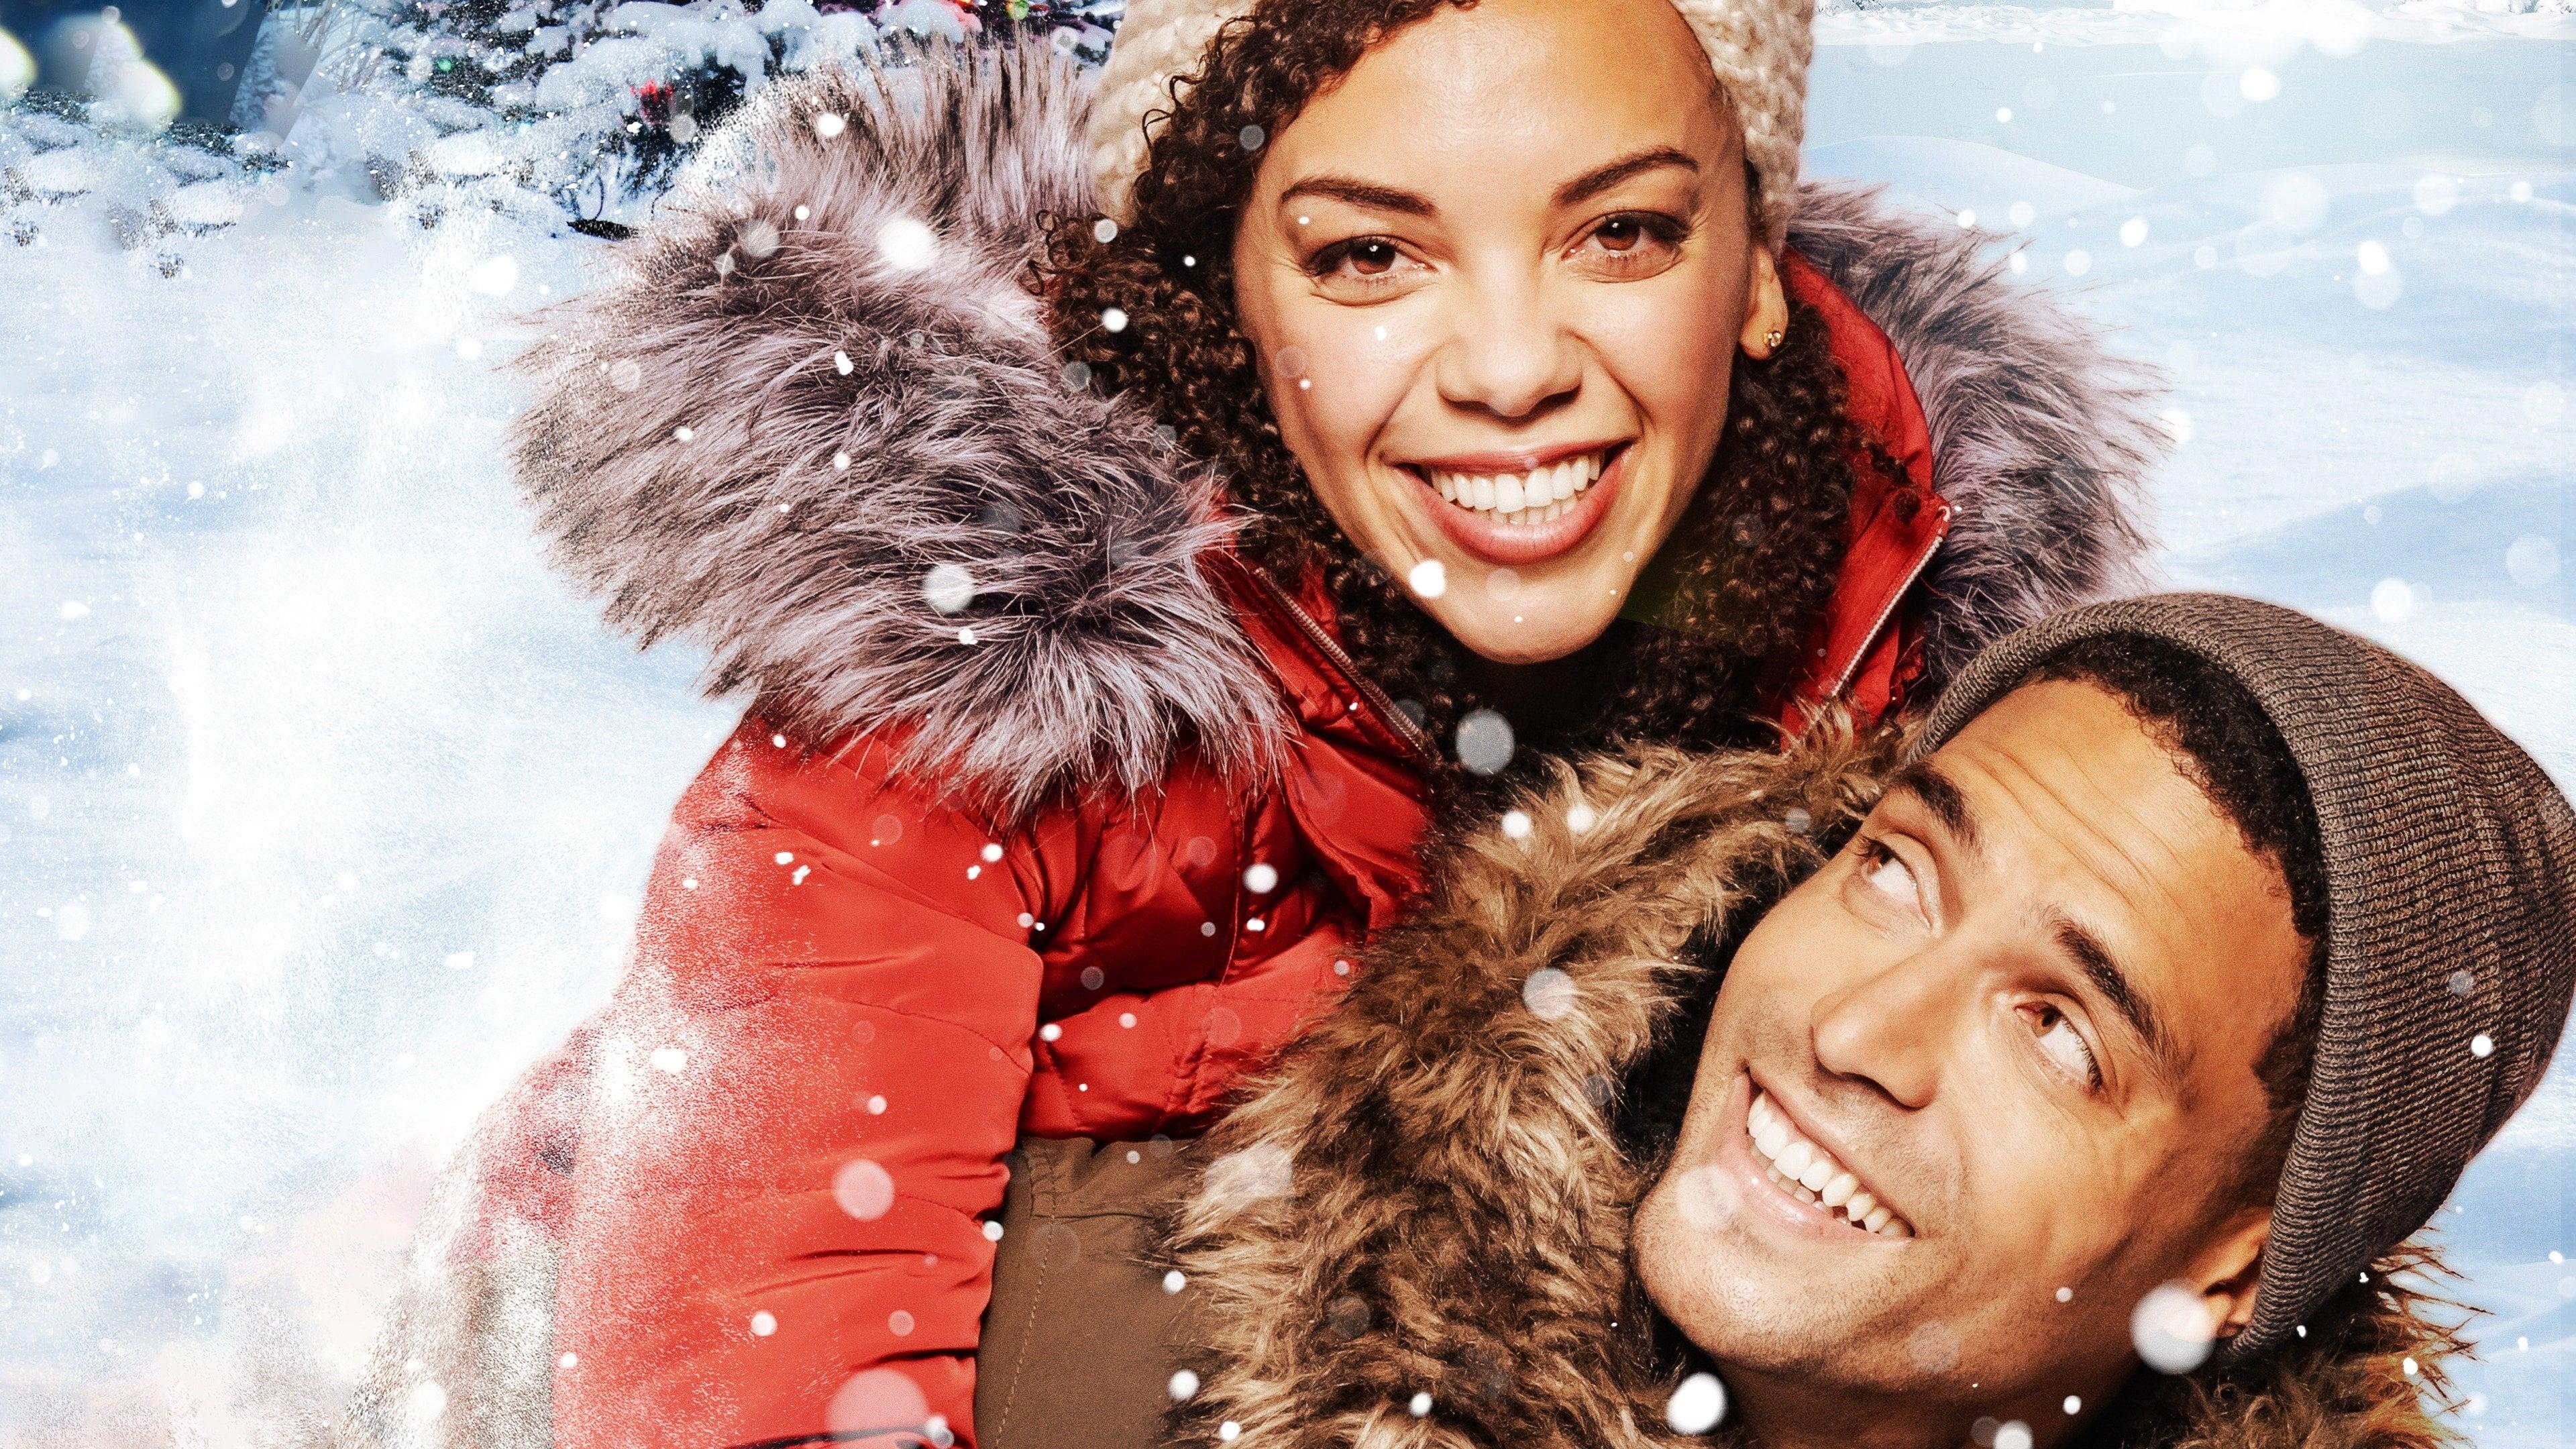 Snowbound for Christmas [2019]